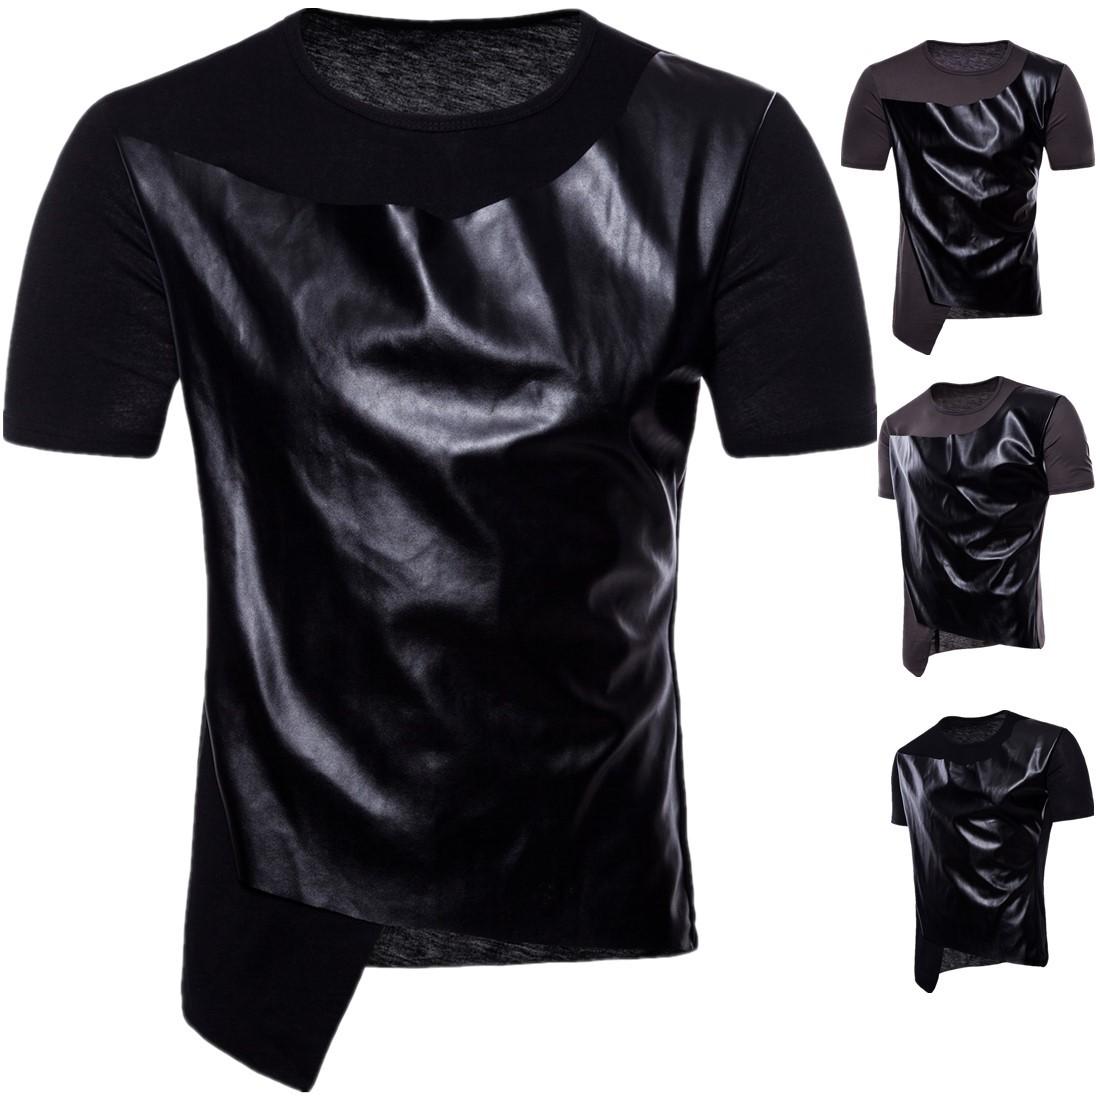 European men's summer new men's short sleeve crew neck T-shirt leather hip hop hip hop T-Shirt Large yt006